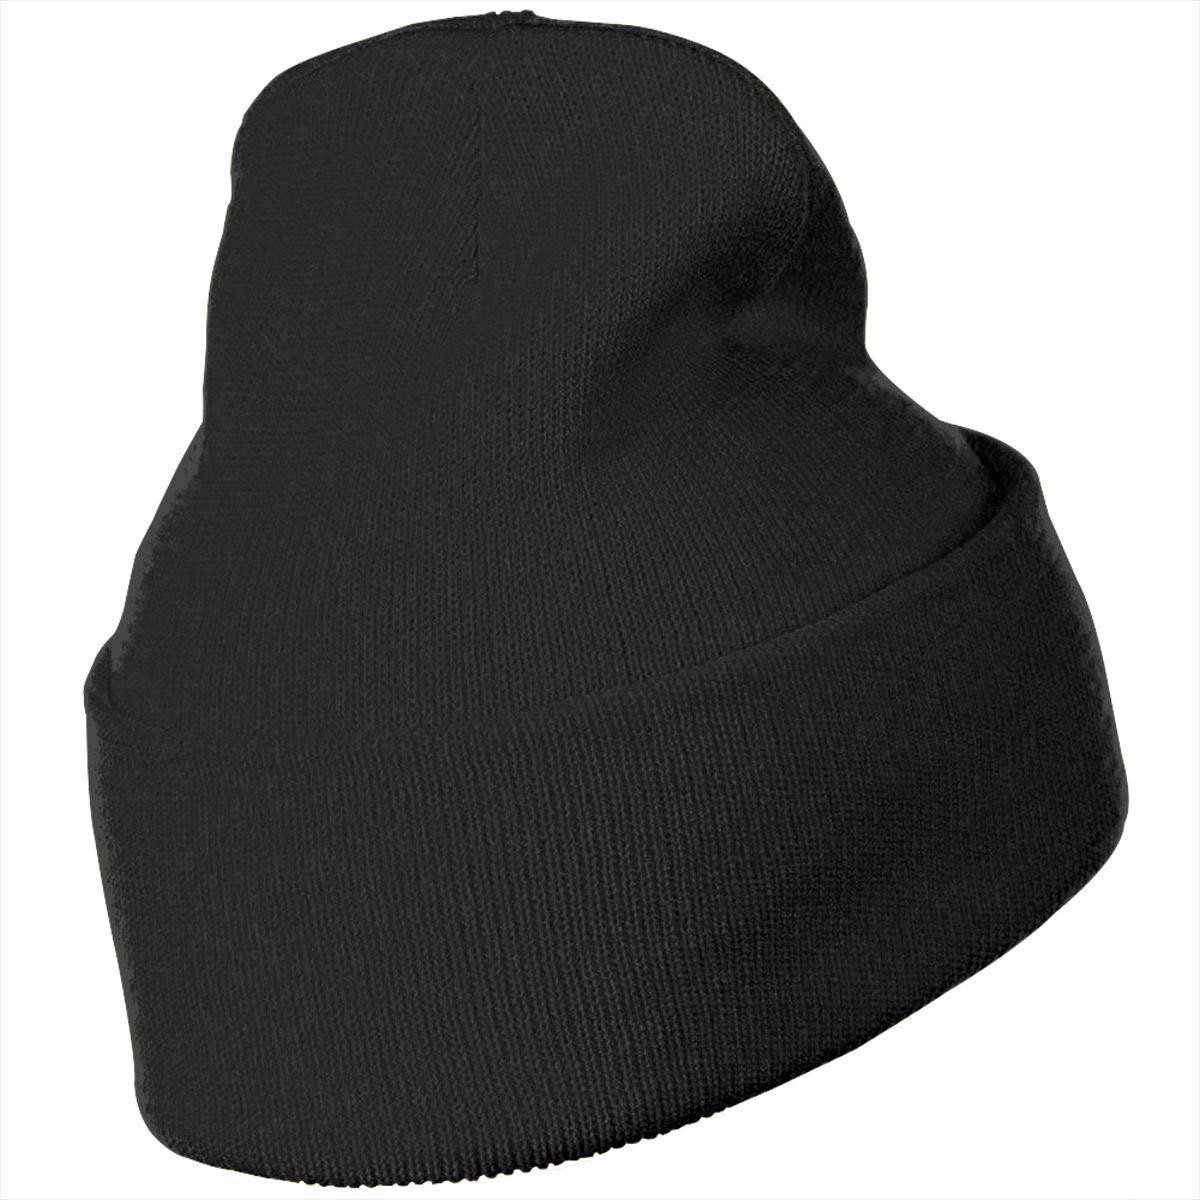 QZqDQ Colorful Tie Dye Unisex Fashion Knitted Hat Luxury Hip-Hop Cap